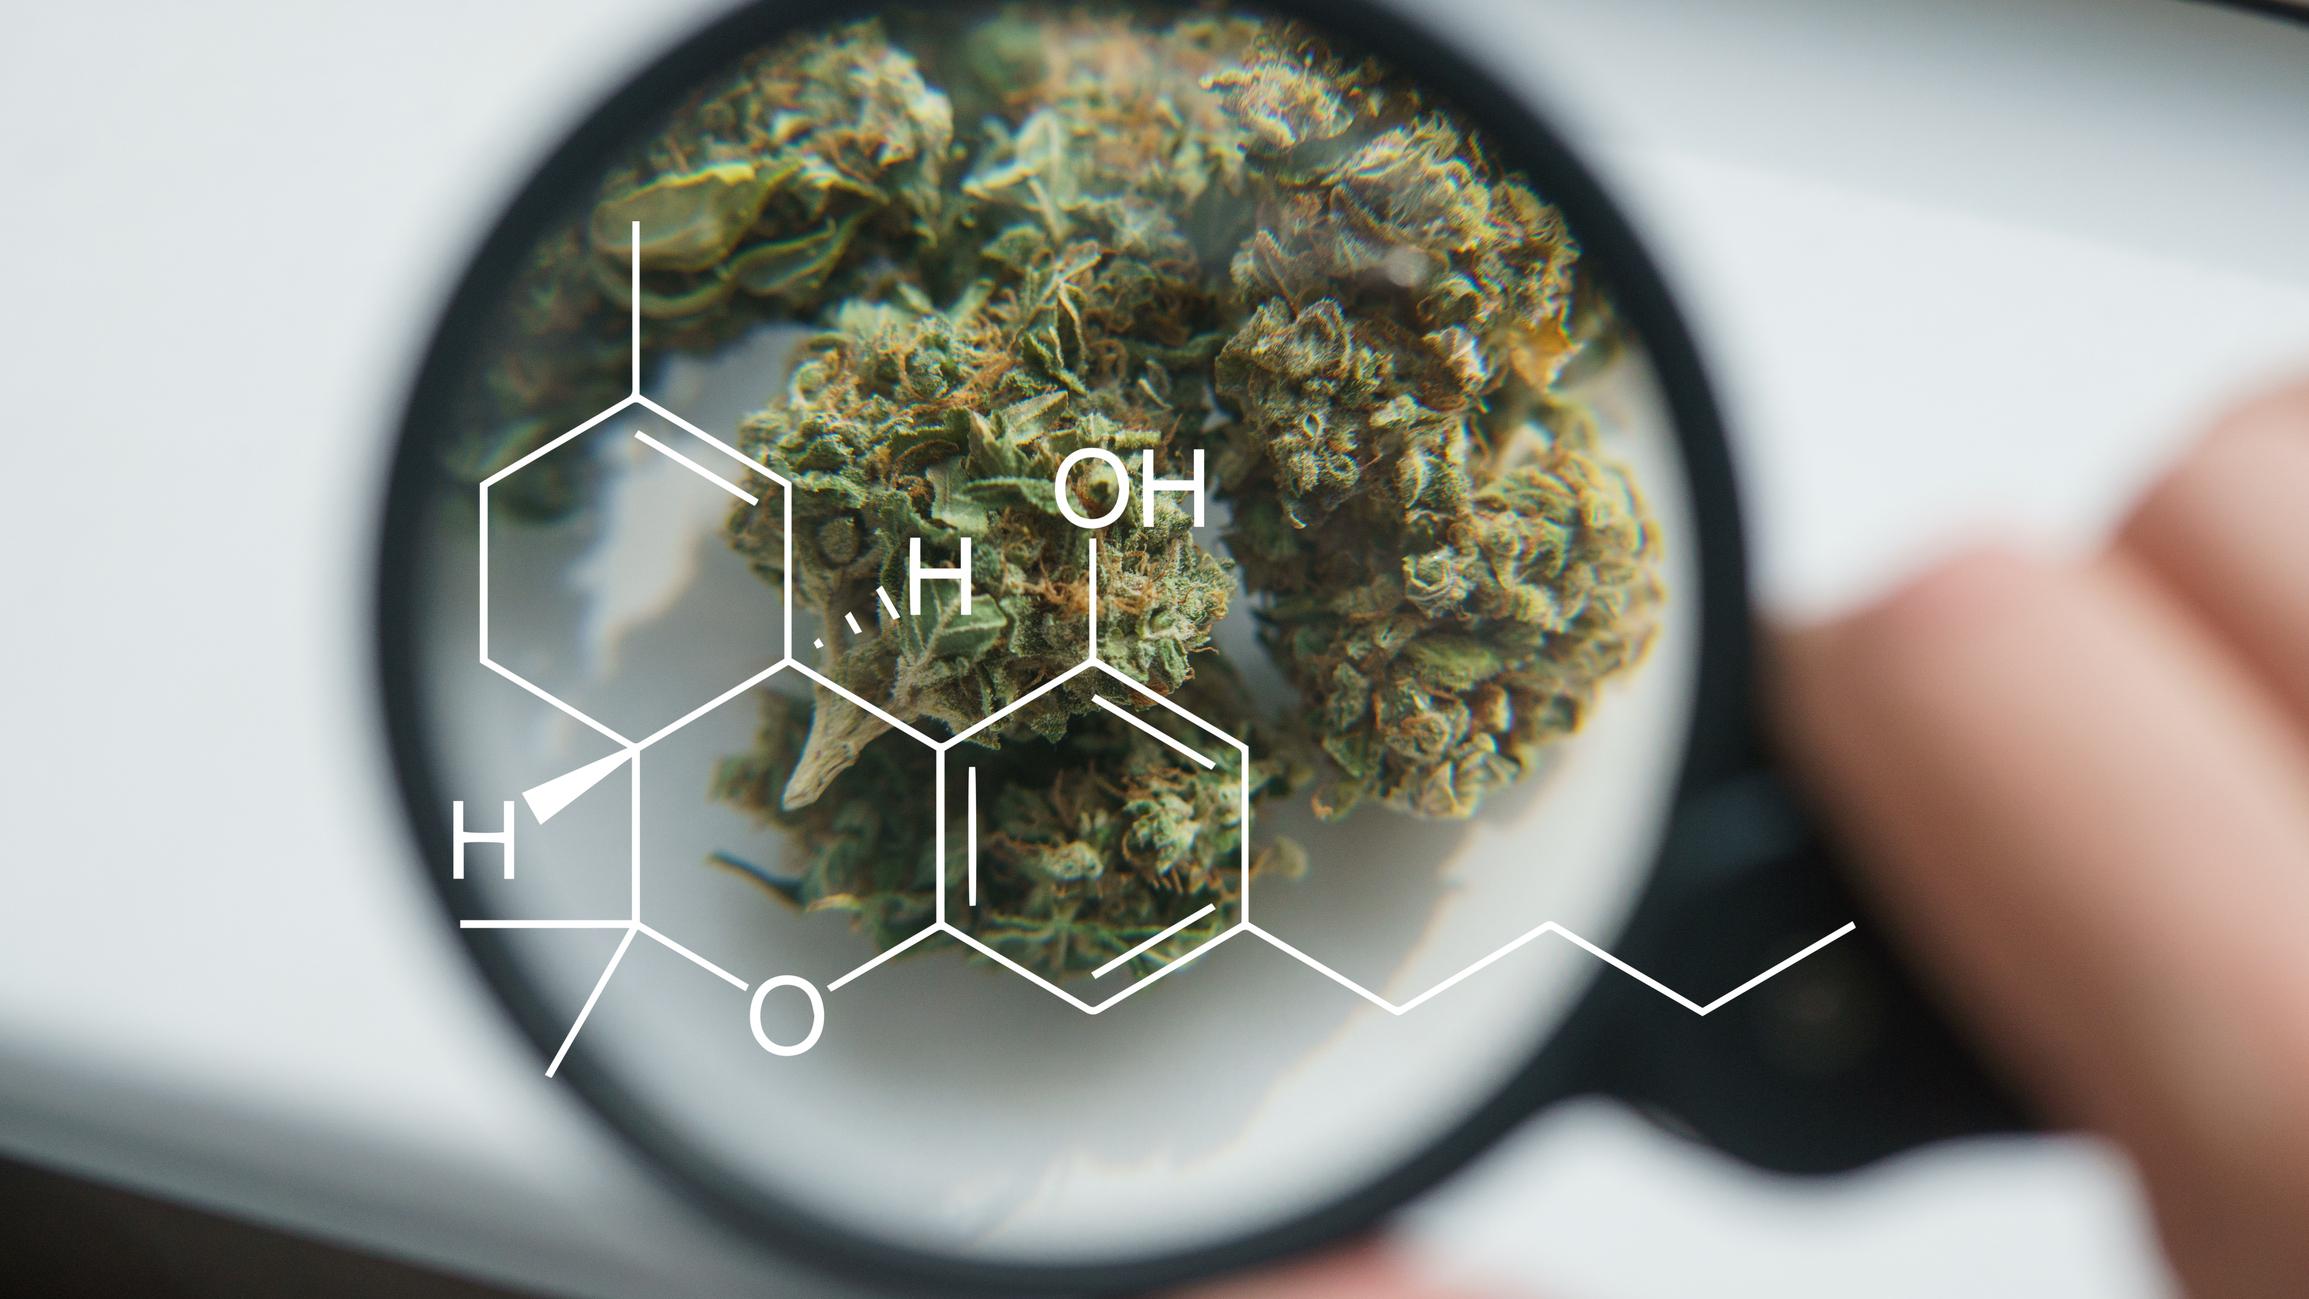 Marijuana under microscope and the chemical formula for cannabidiol.